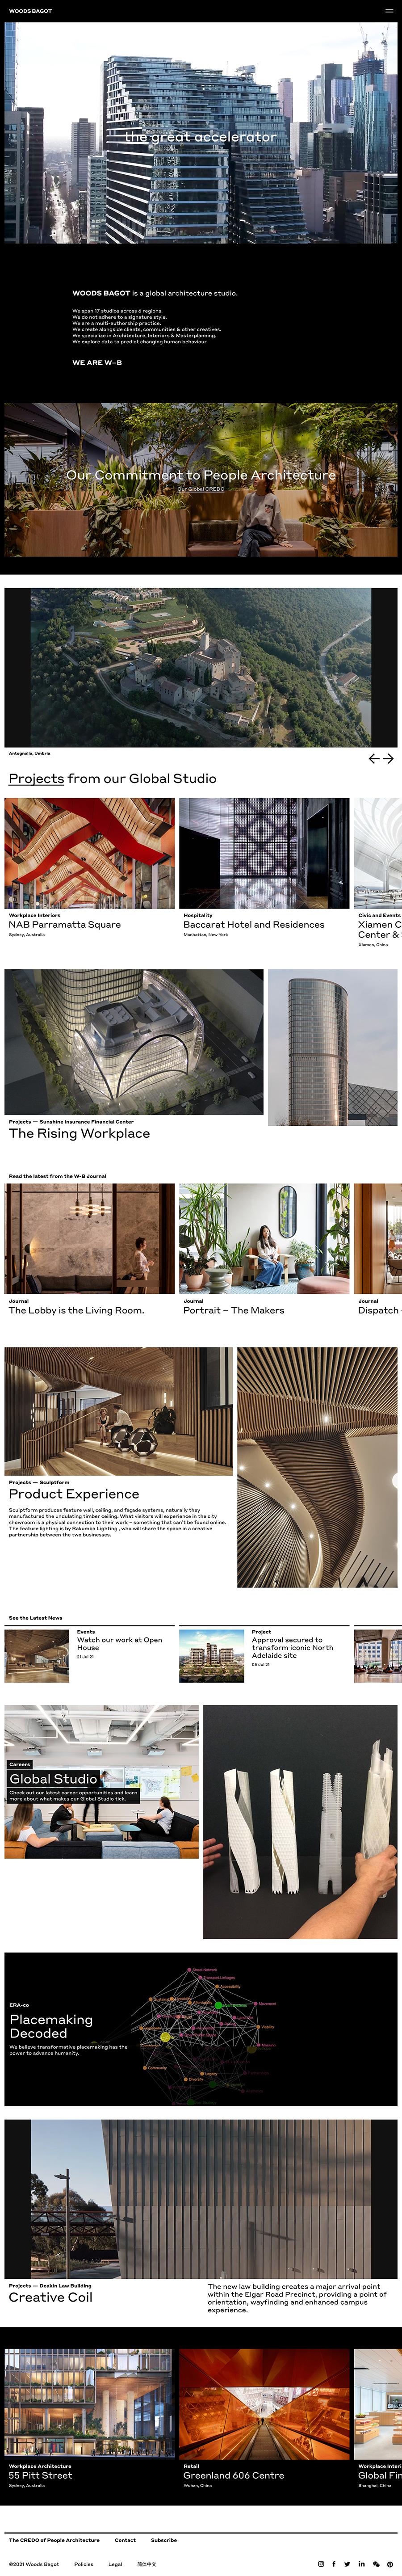 Woods Bagot Best Architecture Website